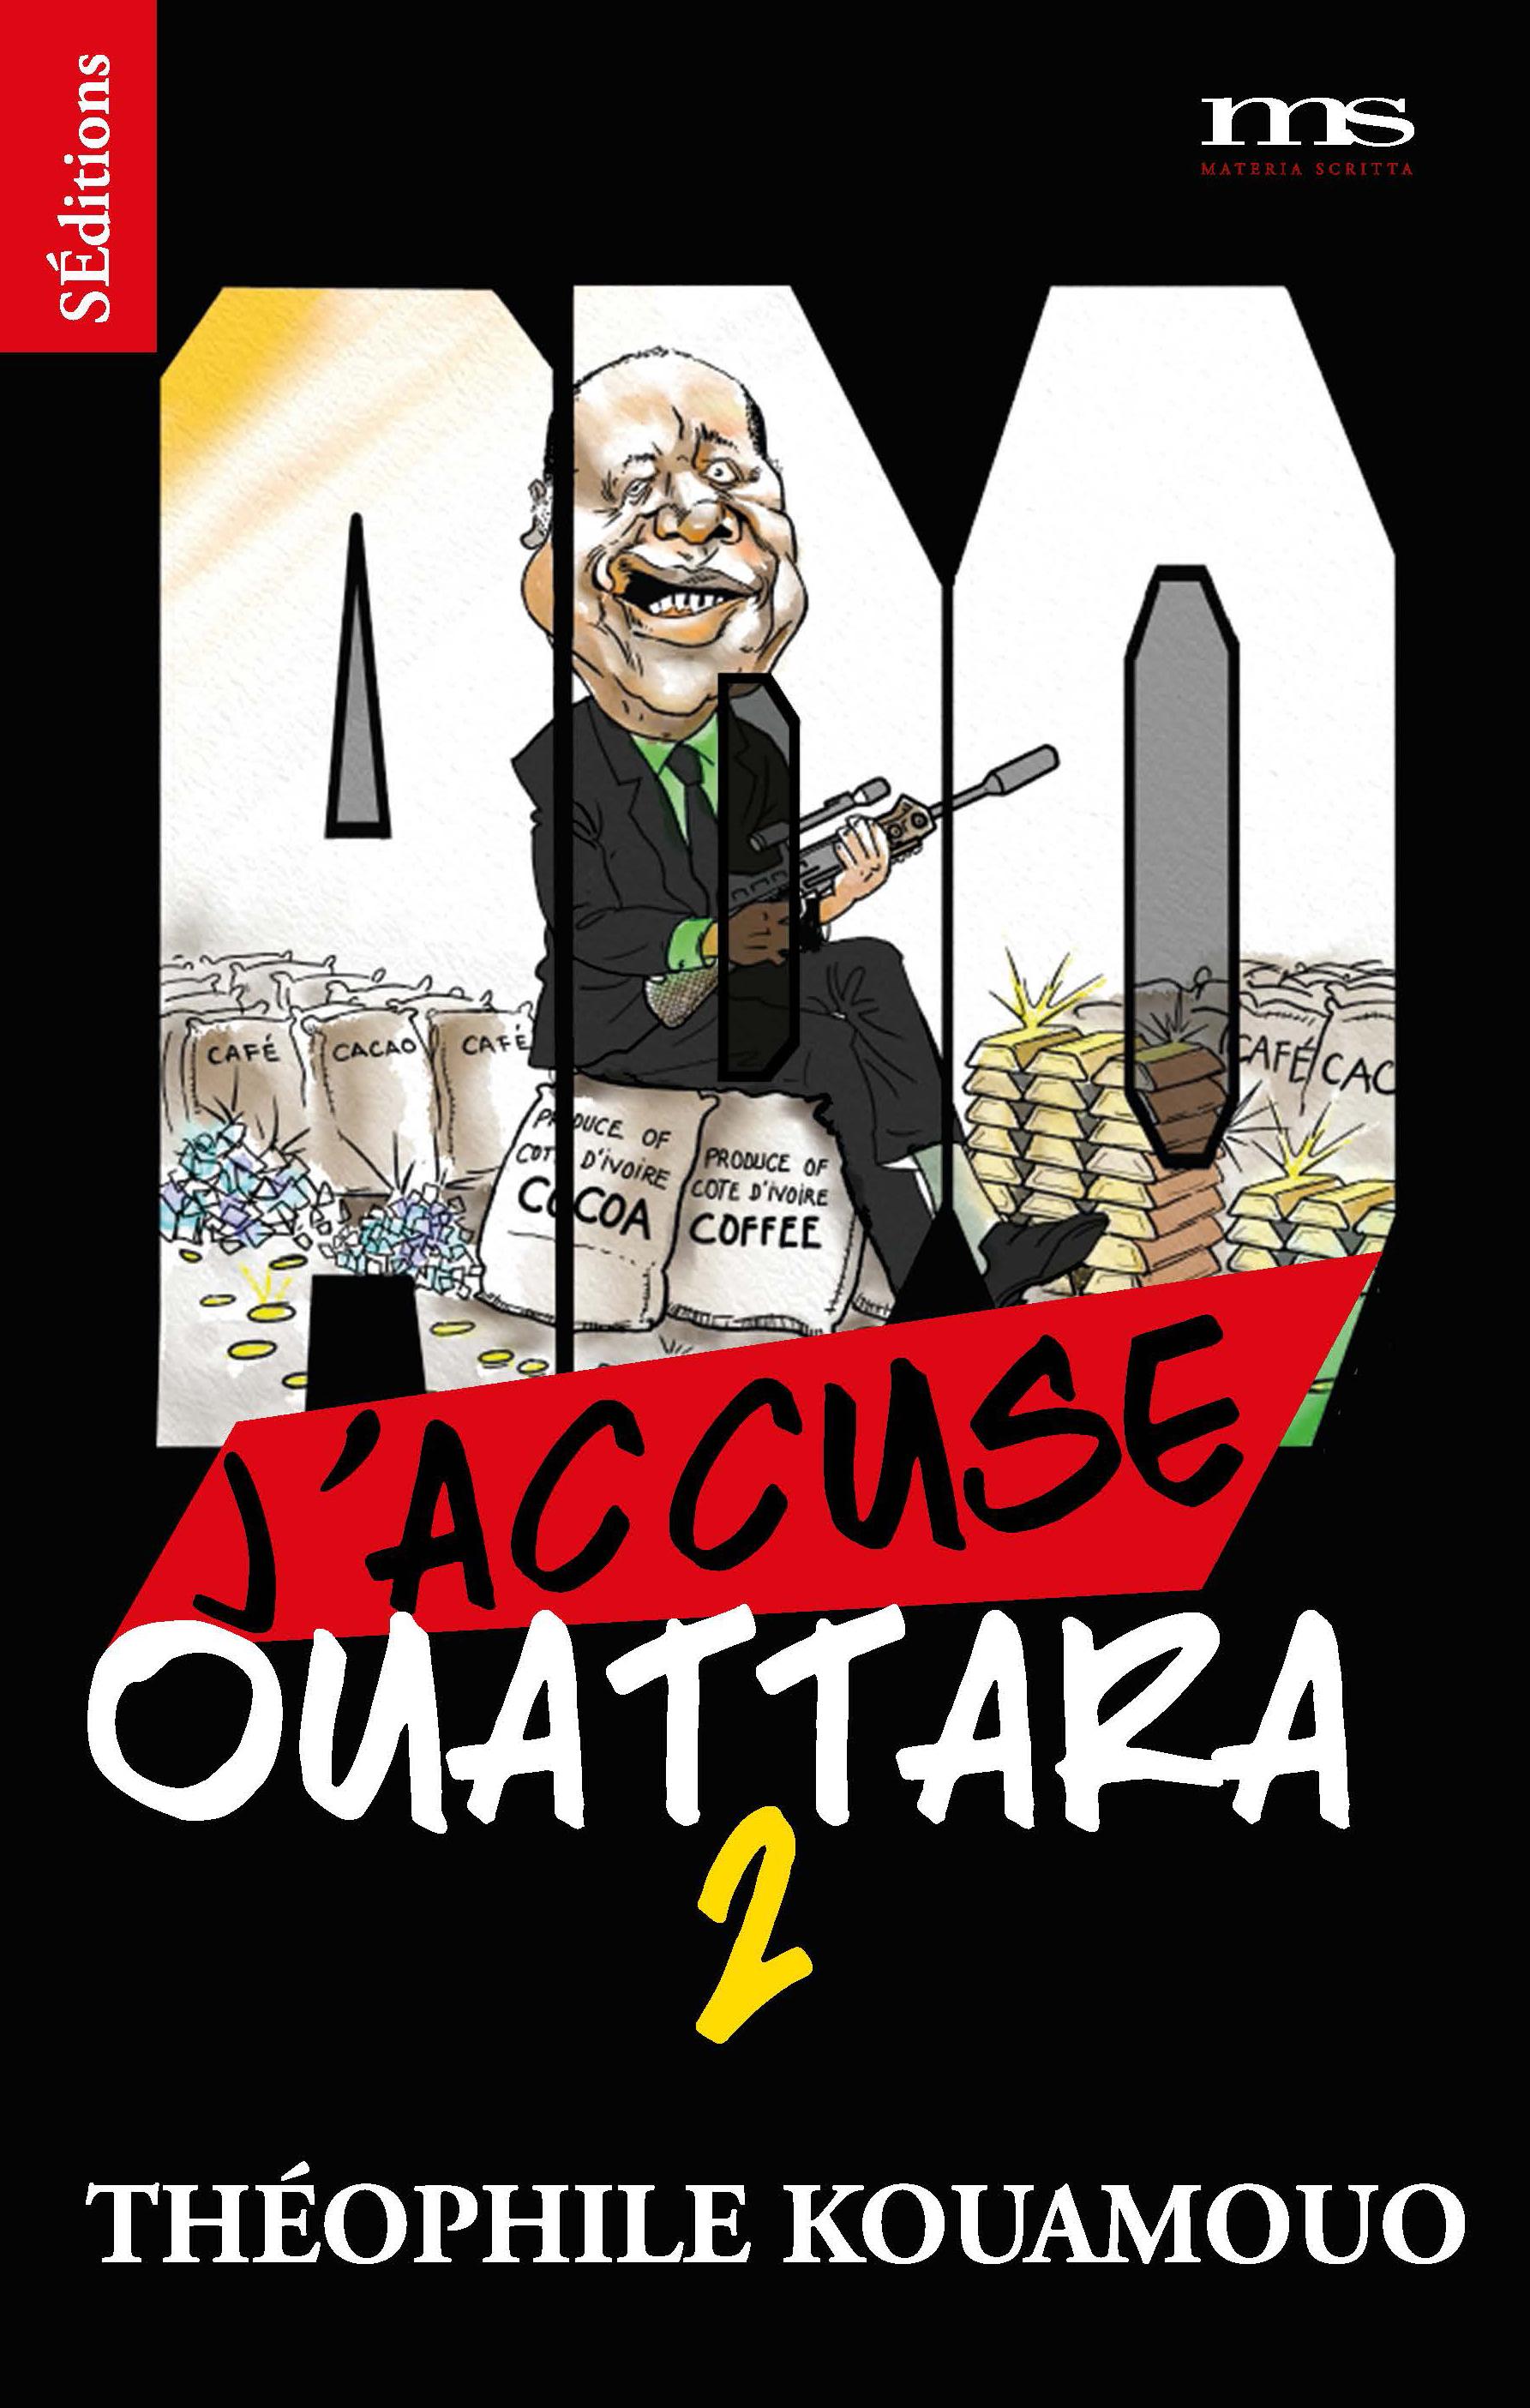 J'accuse Ouattara - vect couv_Page_1.jpg